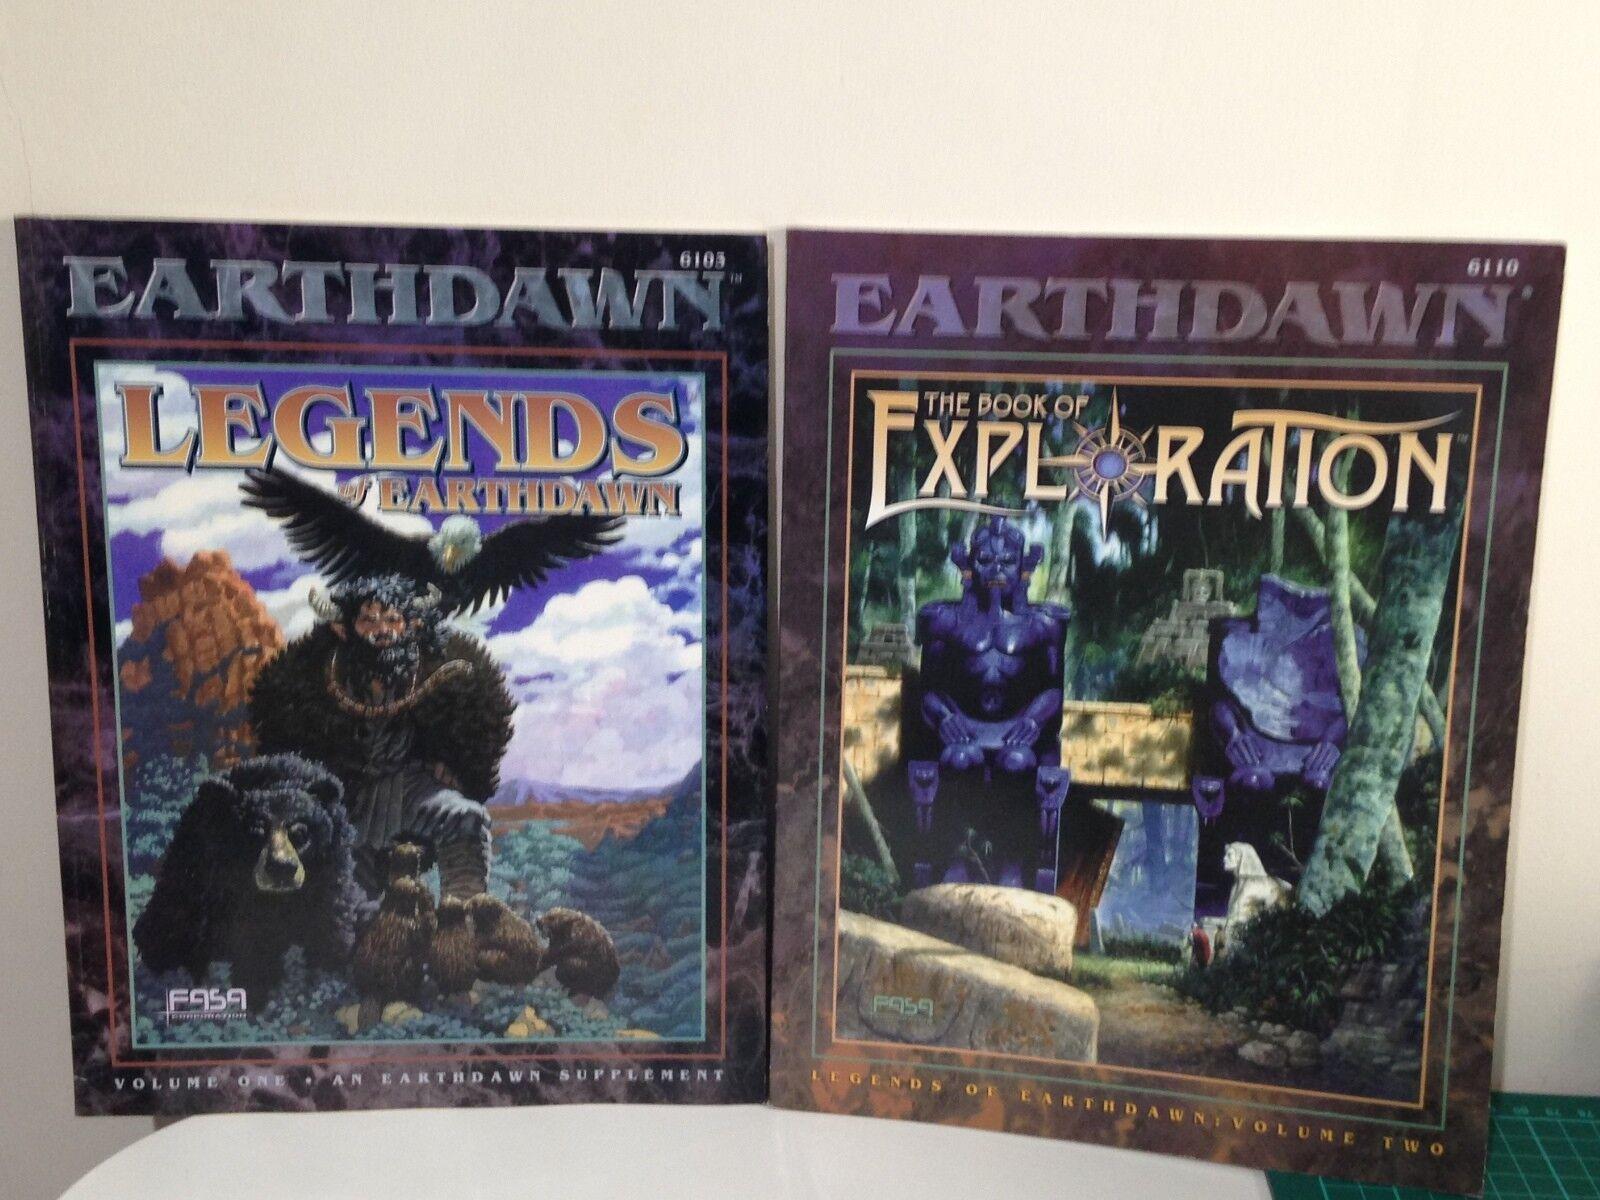 Earthdawn-Legends of earthdawn volumi 1 e 2  6103 &  6110 - NUOVO